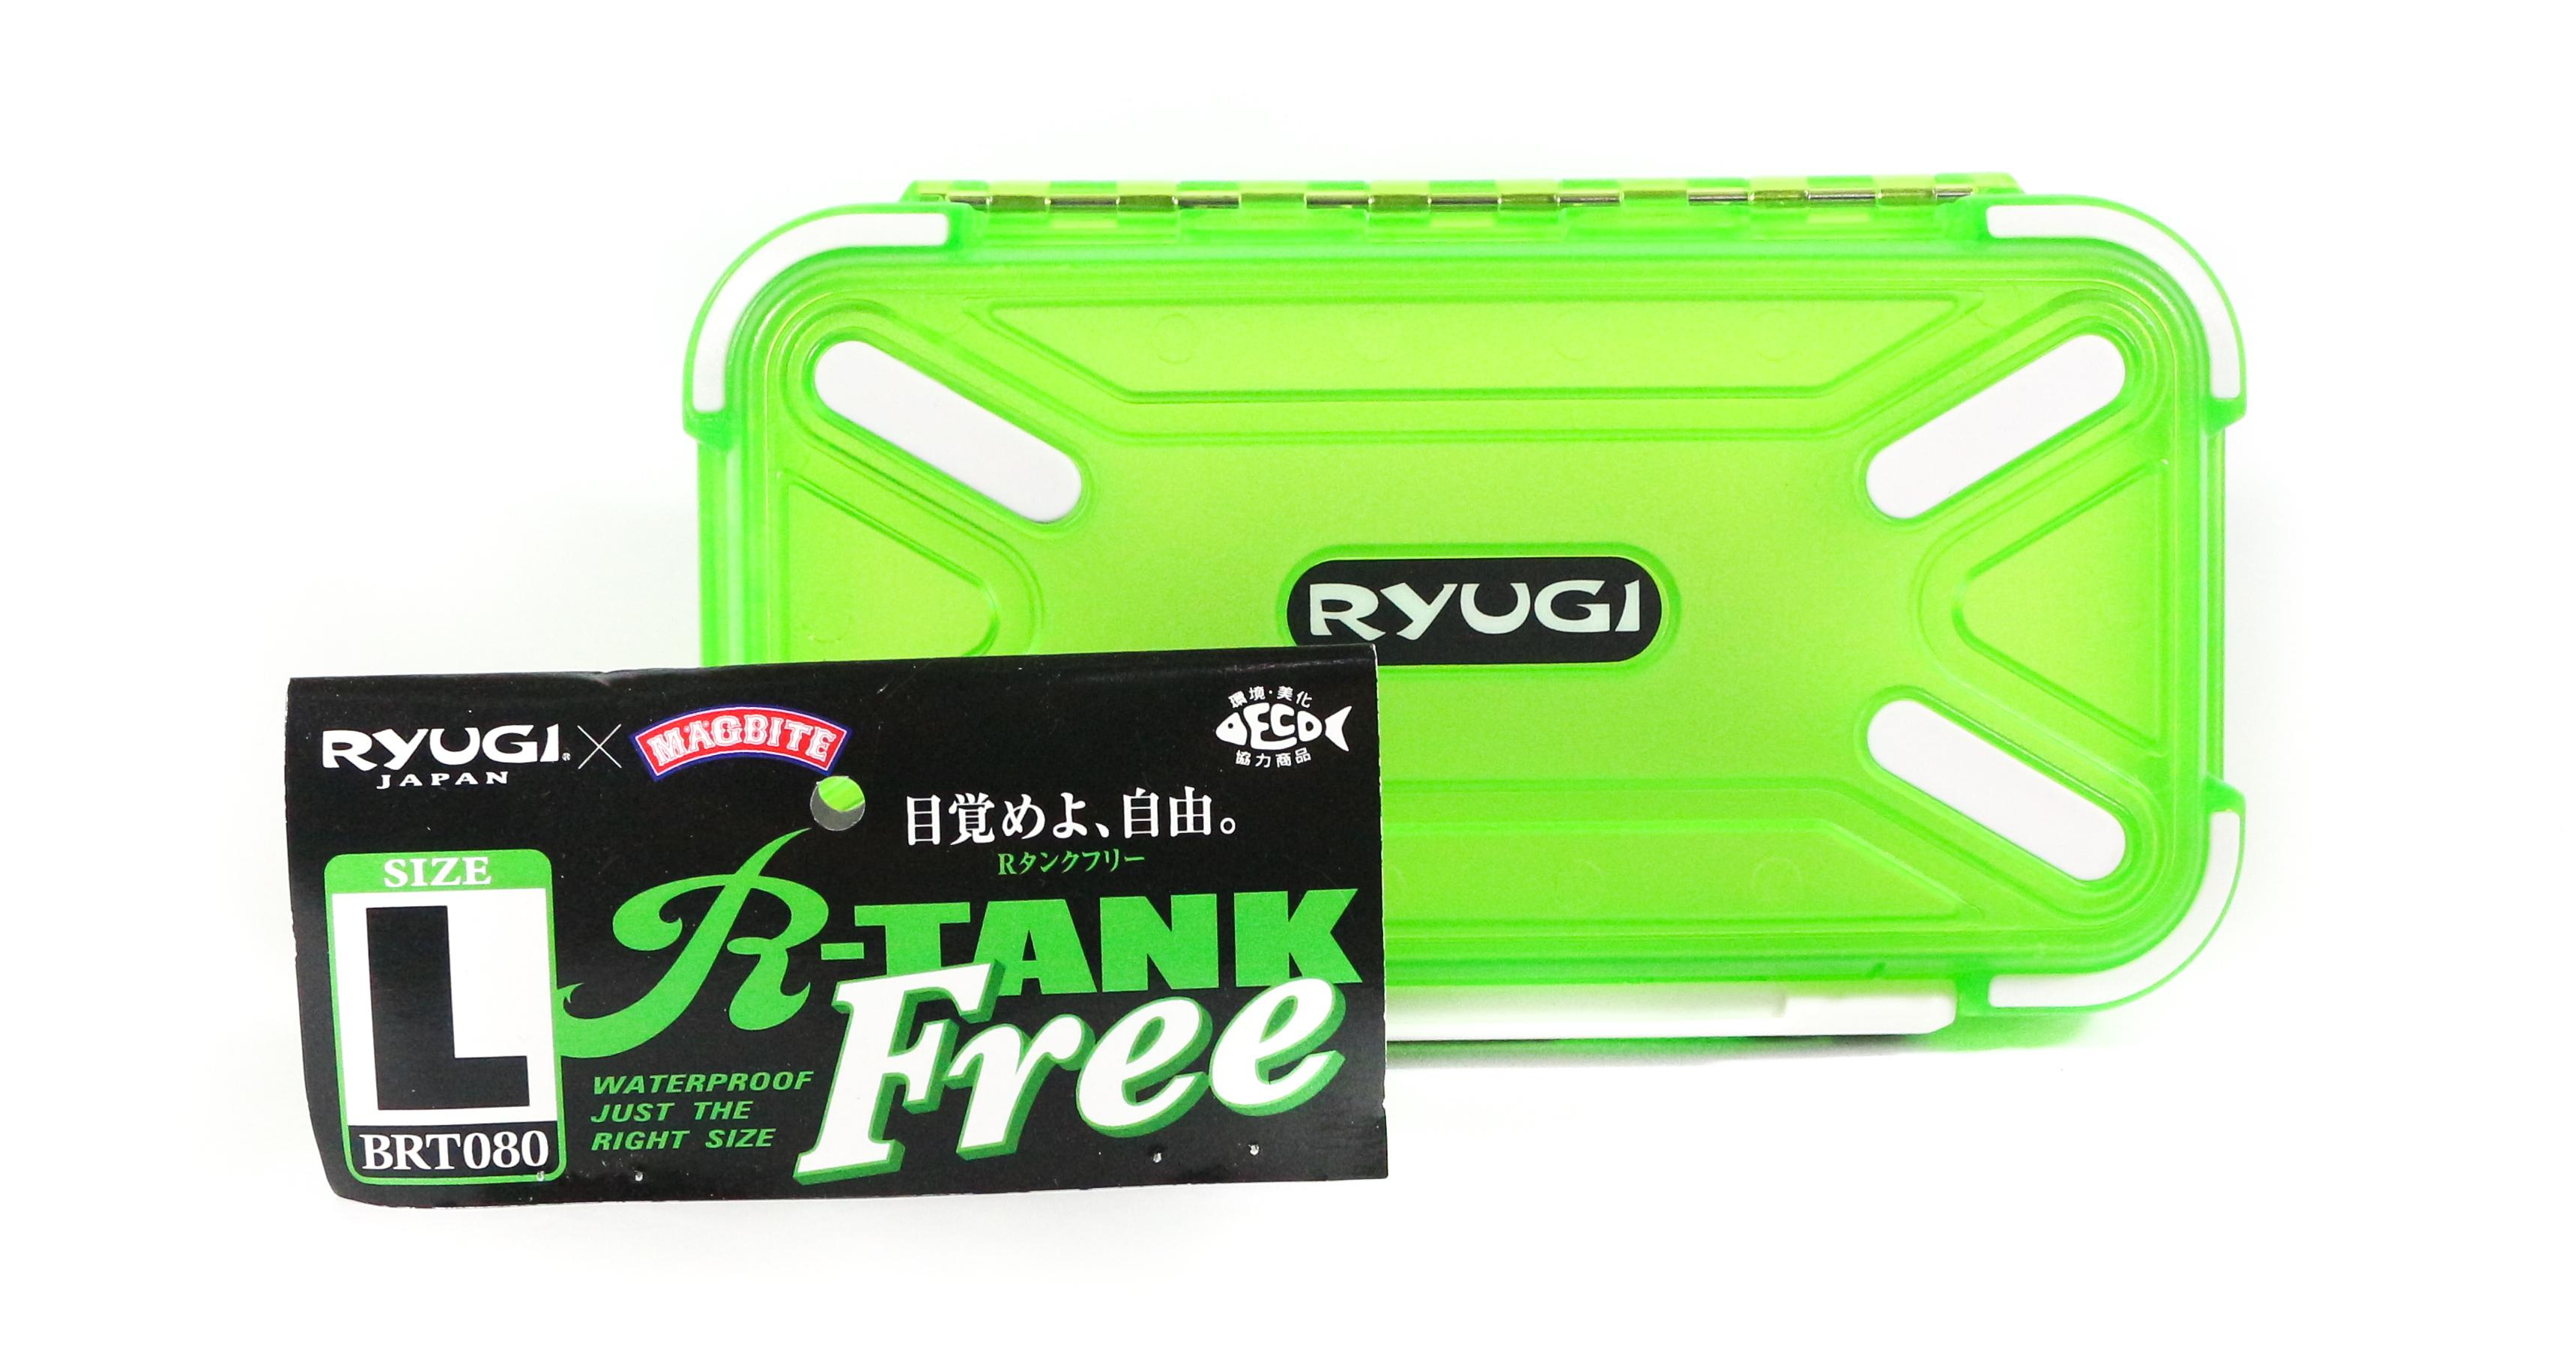 Ryugi BRT080 R-Tank Free Case Tackle Box Size L (3271)